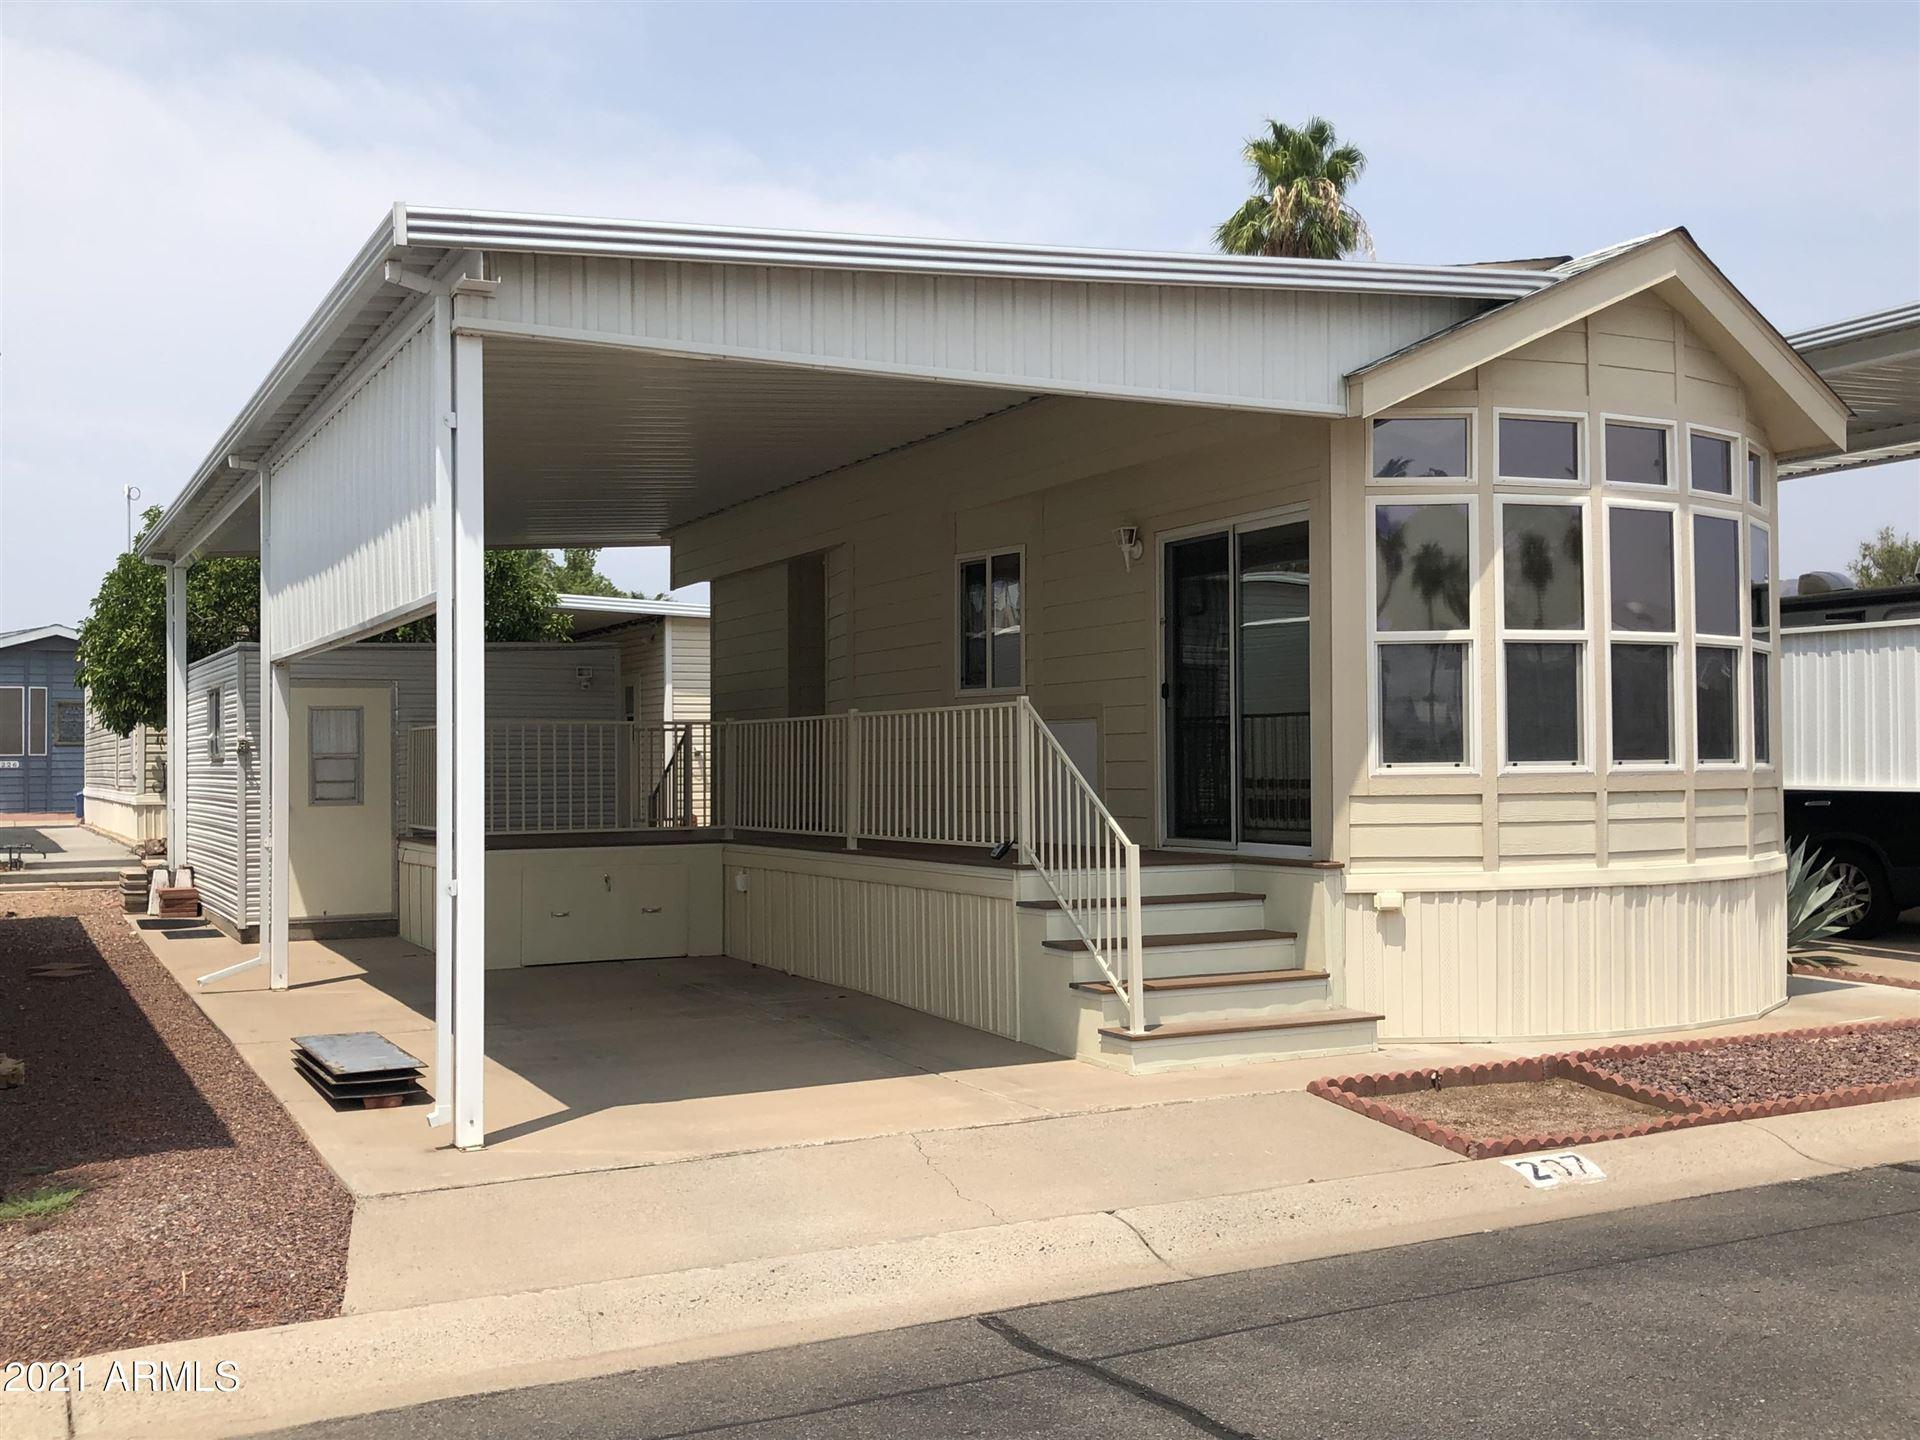 Photo of 207 S NIGHTDIGGER Drive, Apache Junction, AZ 85119 (MLS # 6268635)